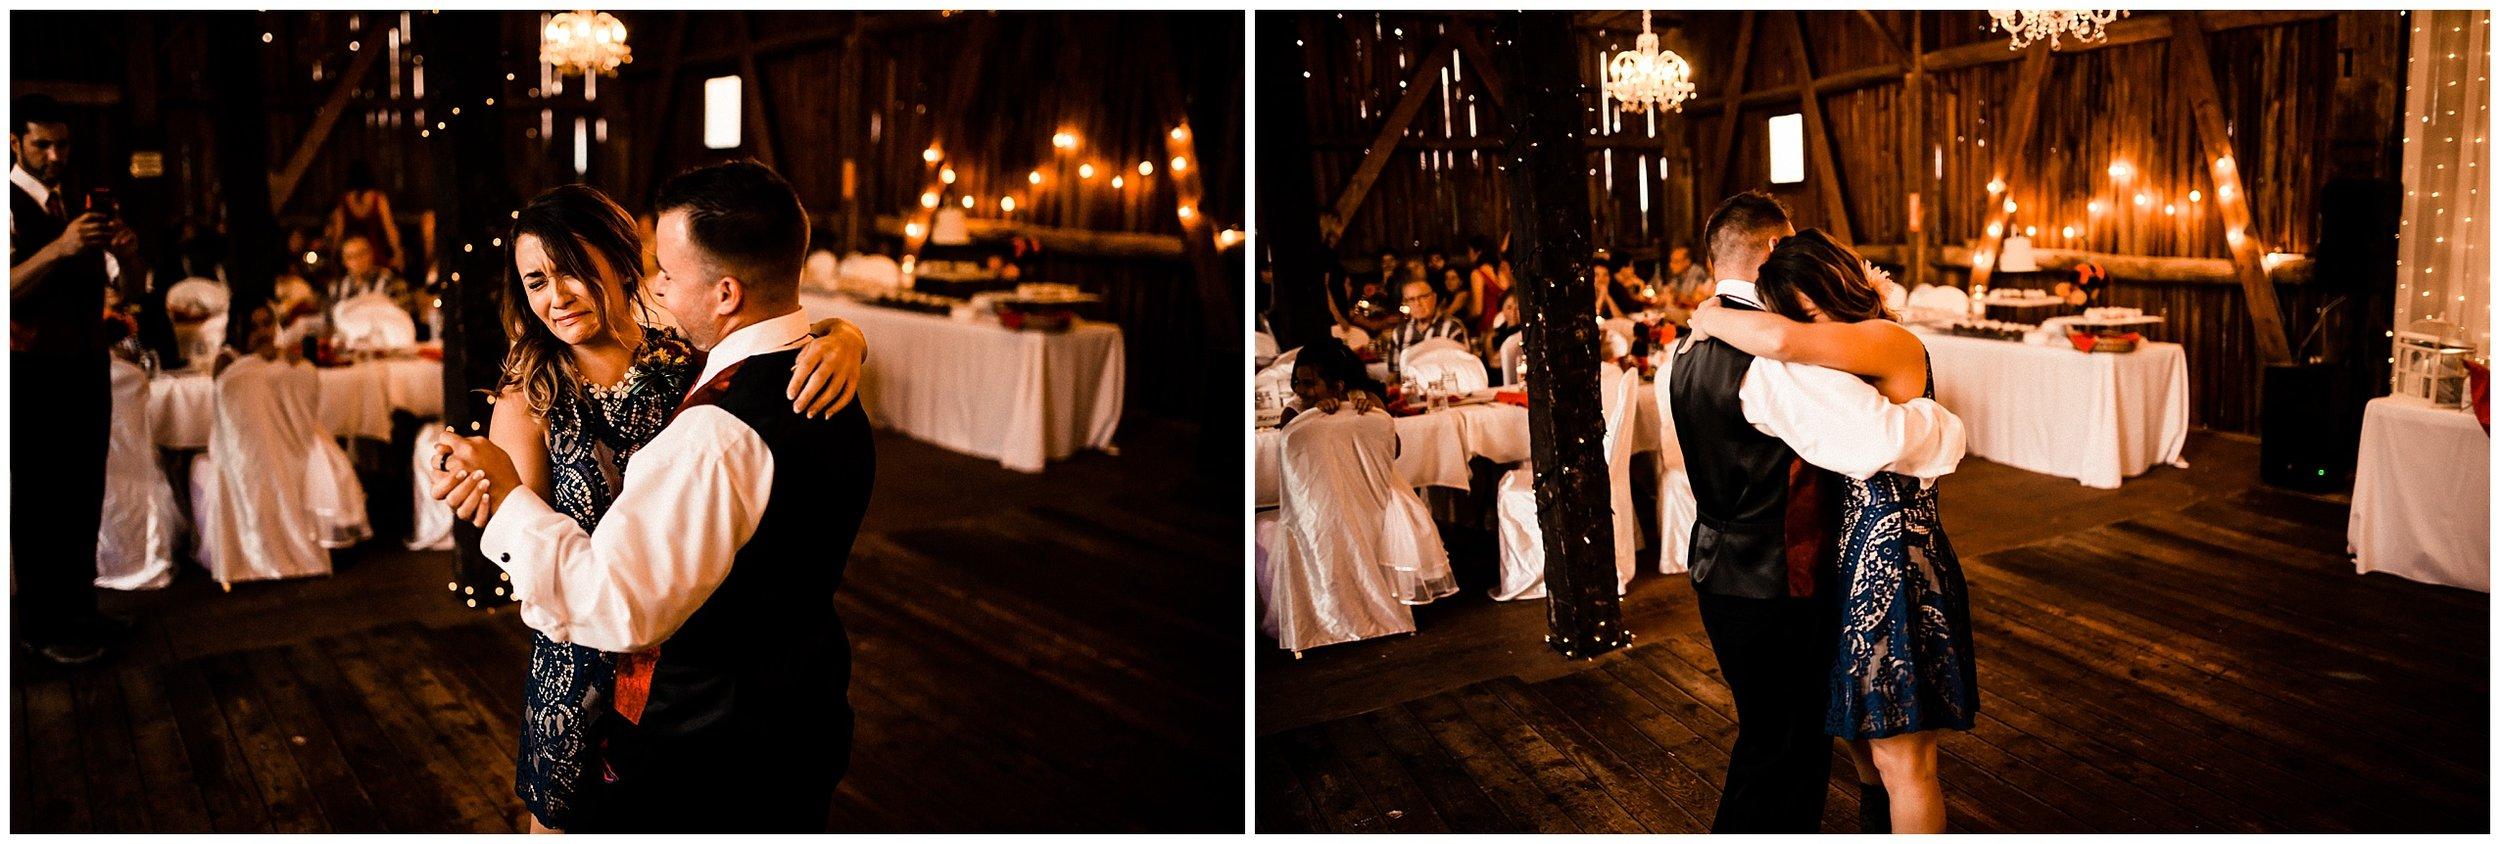 Micheal + Chelsie   Just Married #kyleepaigephotography_1618.jpg